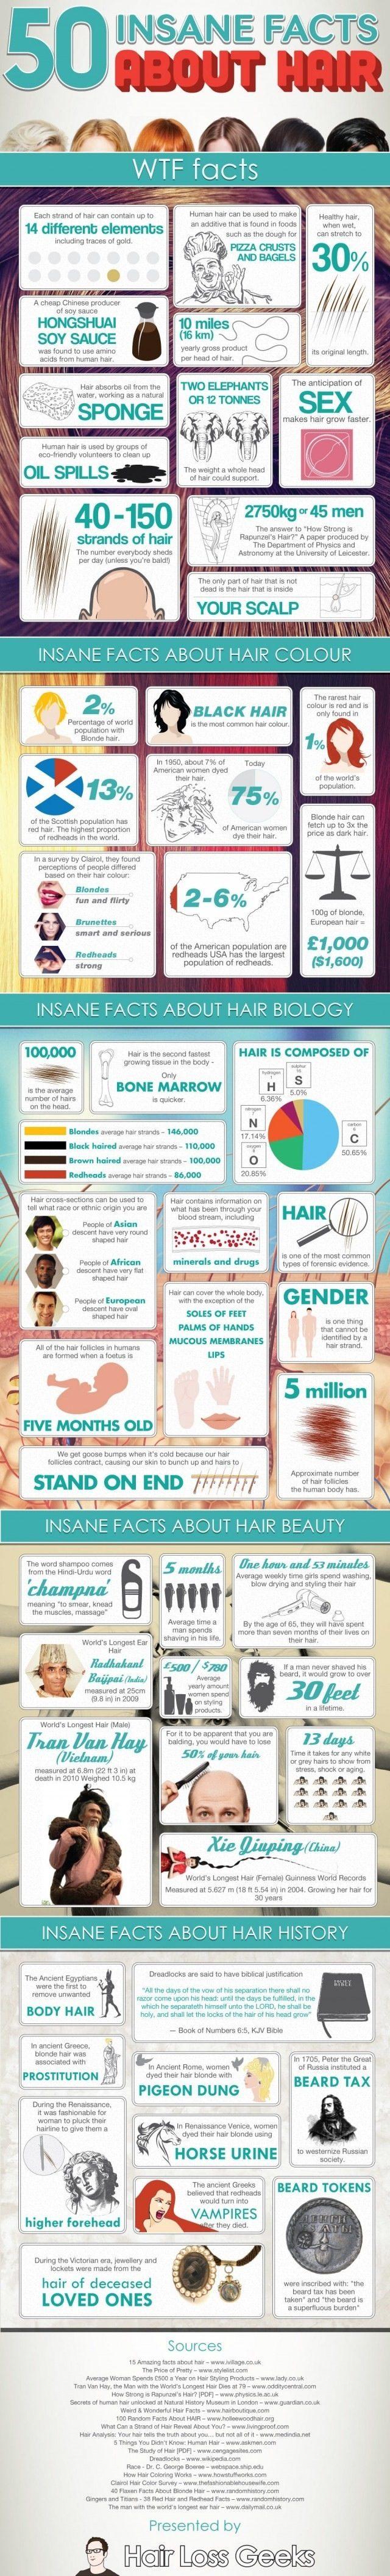 fakta om hår